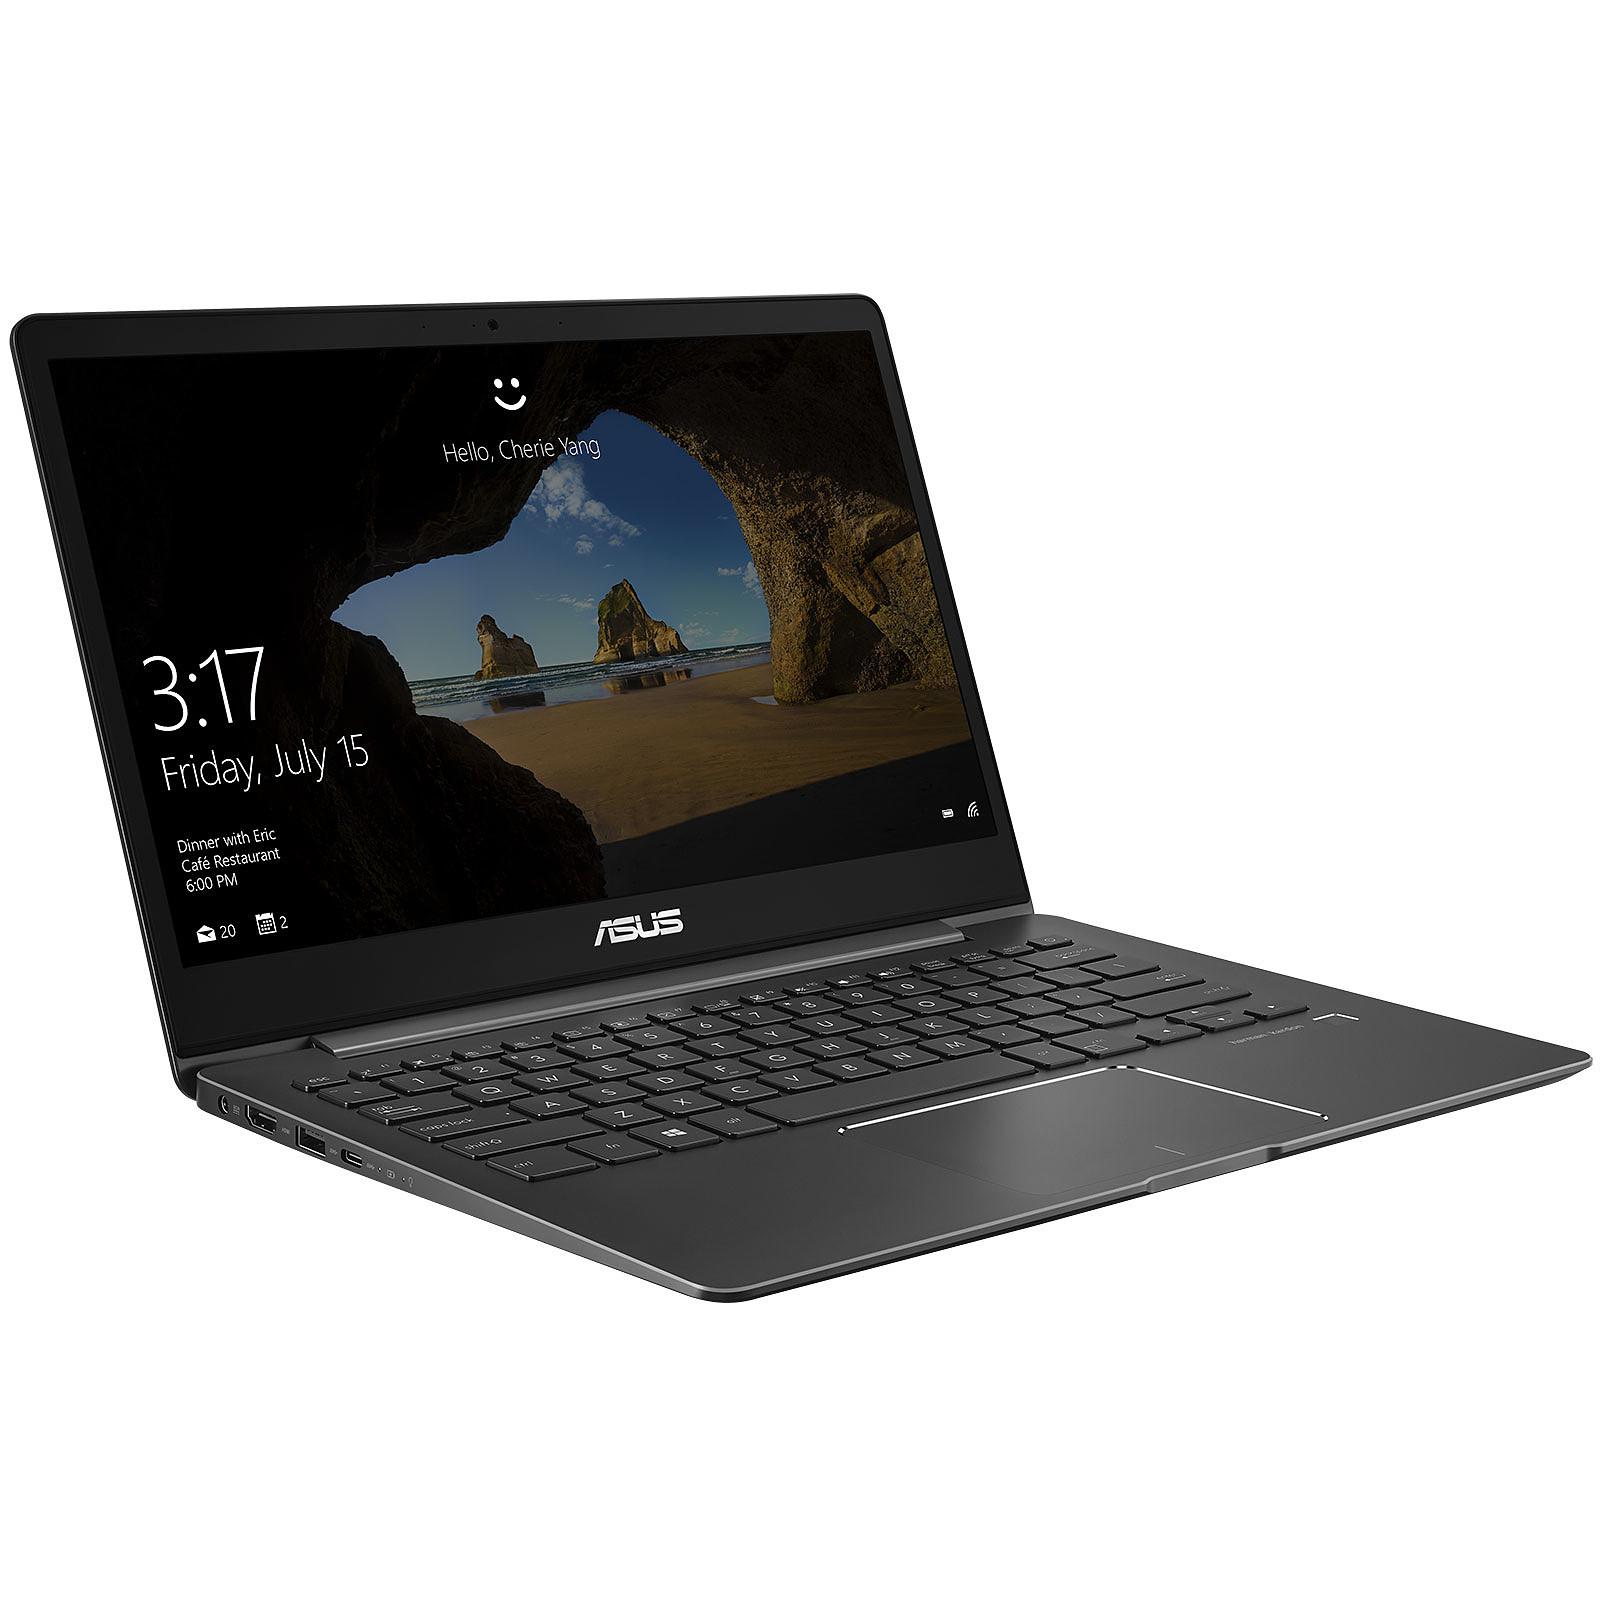 ASUS Zenbook 13 UX331FA-EG007T